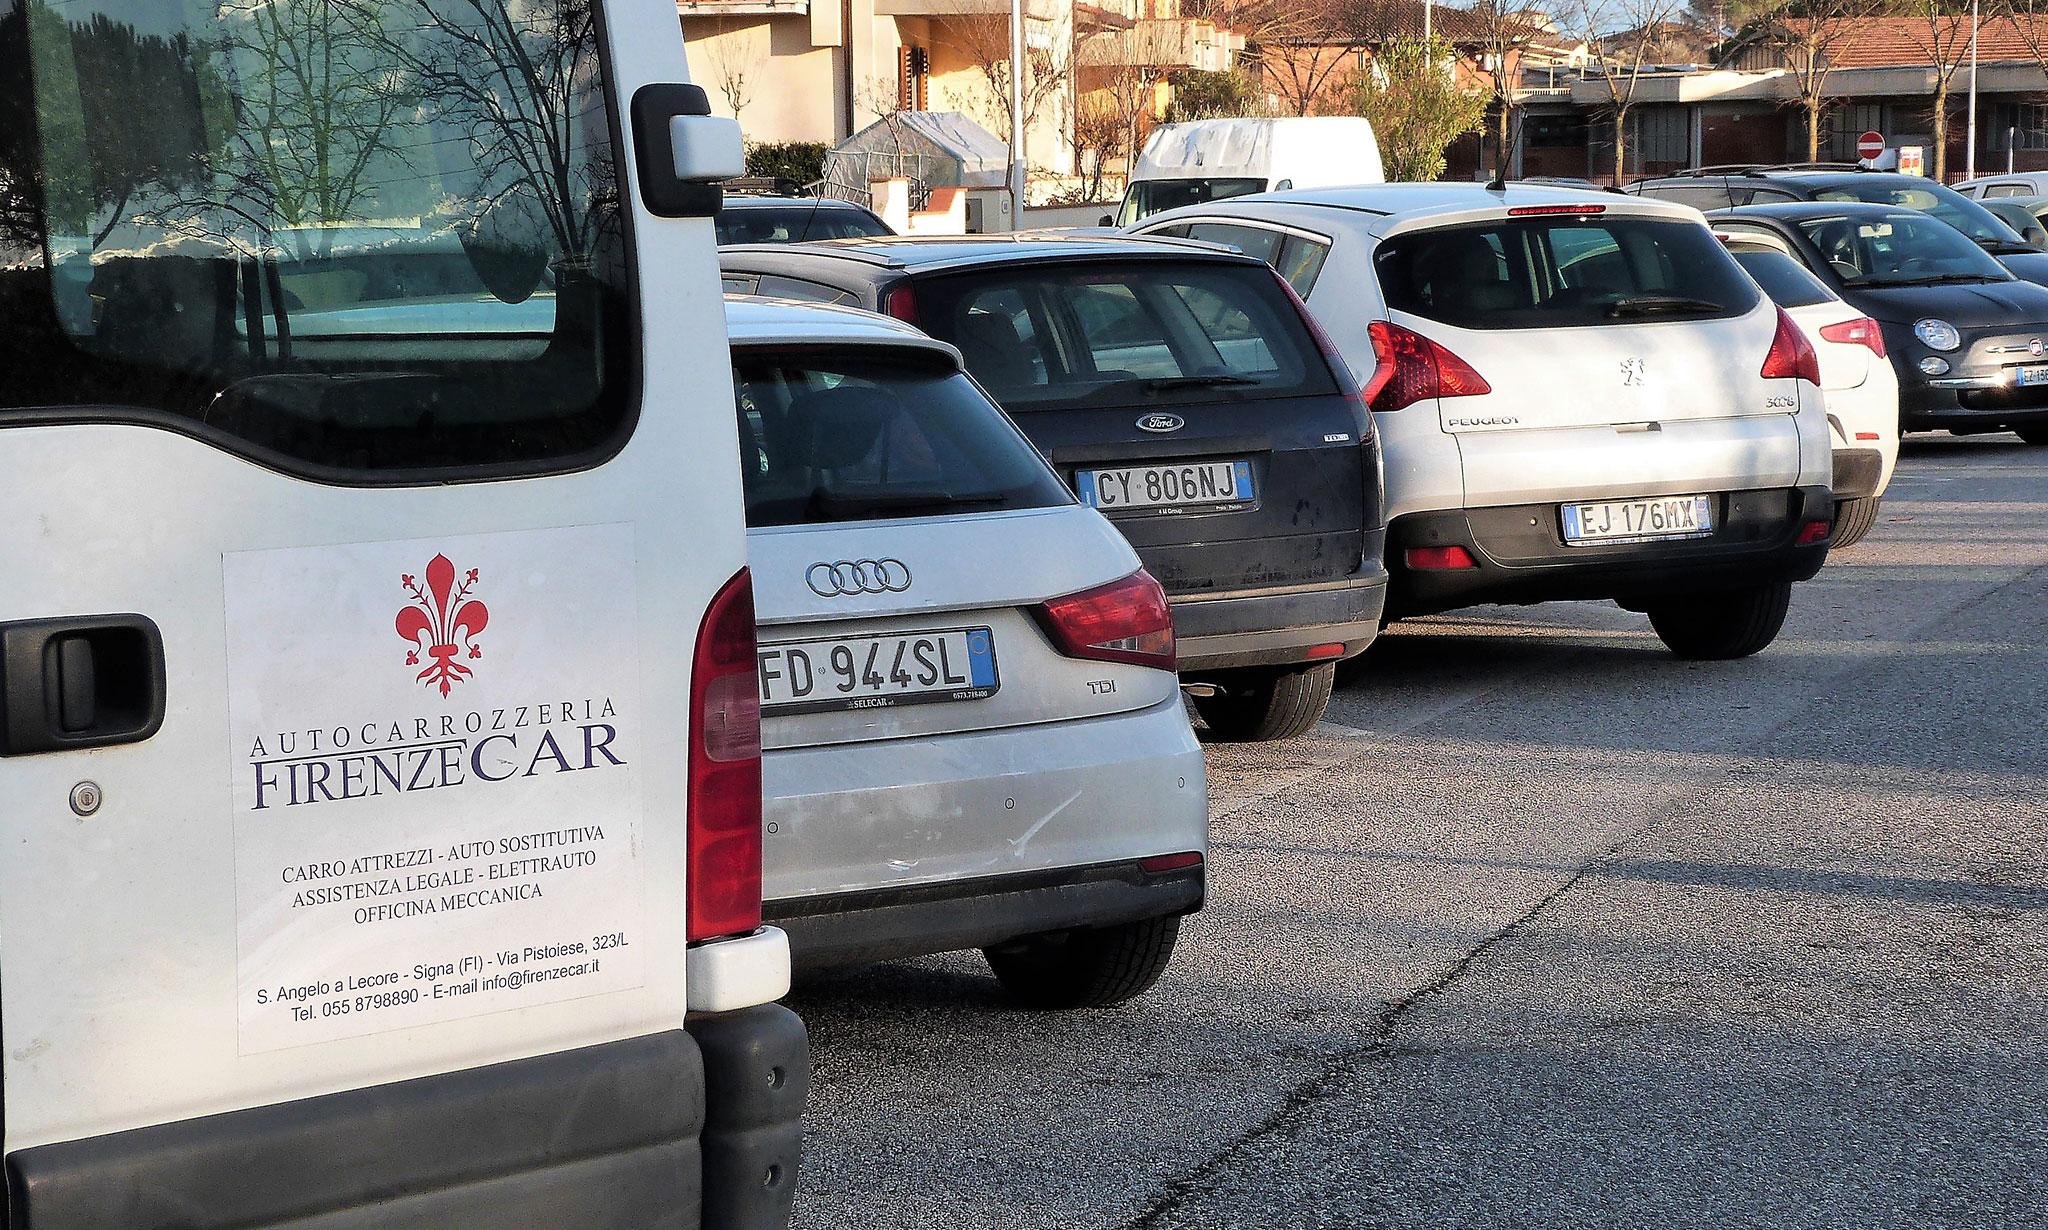 autocarezzeria-Firenze-Car